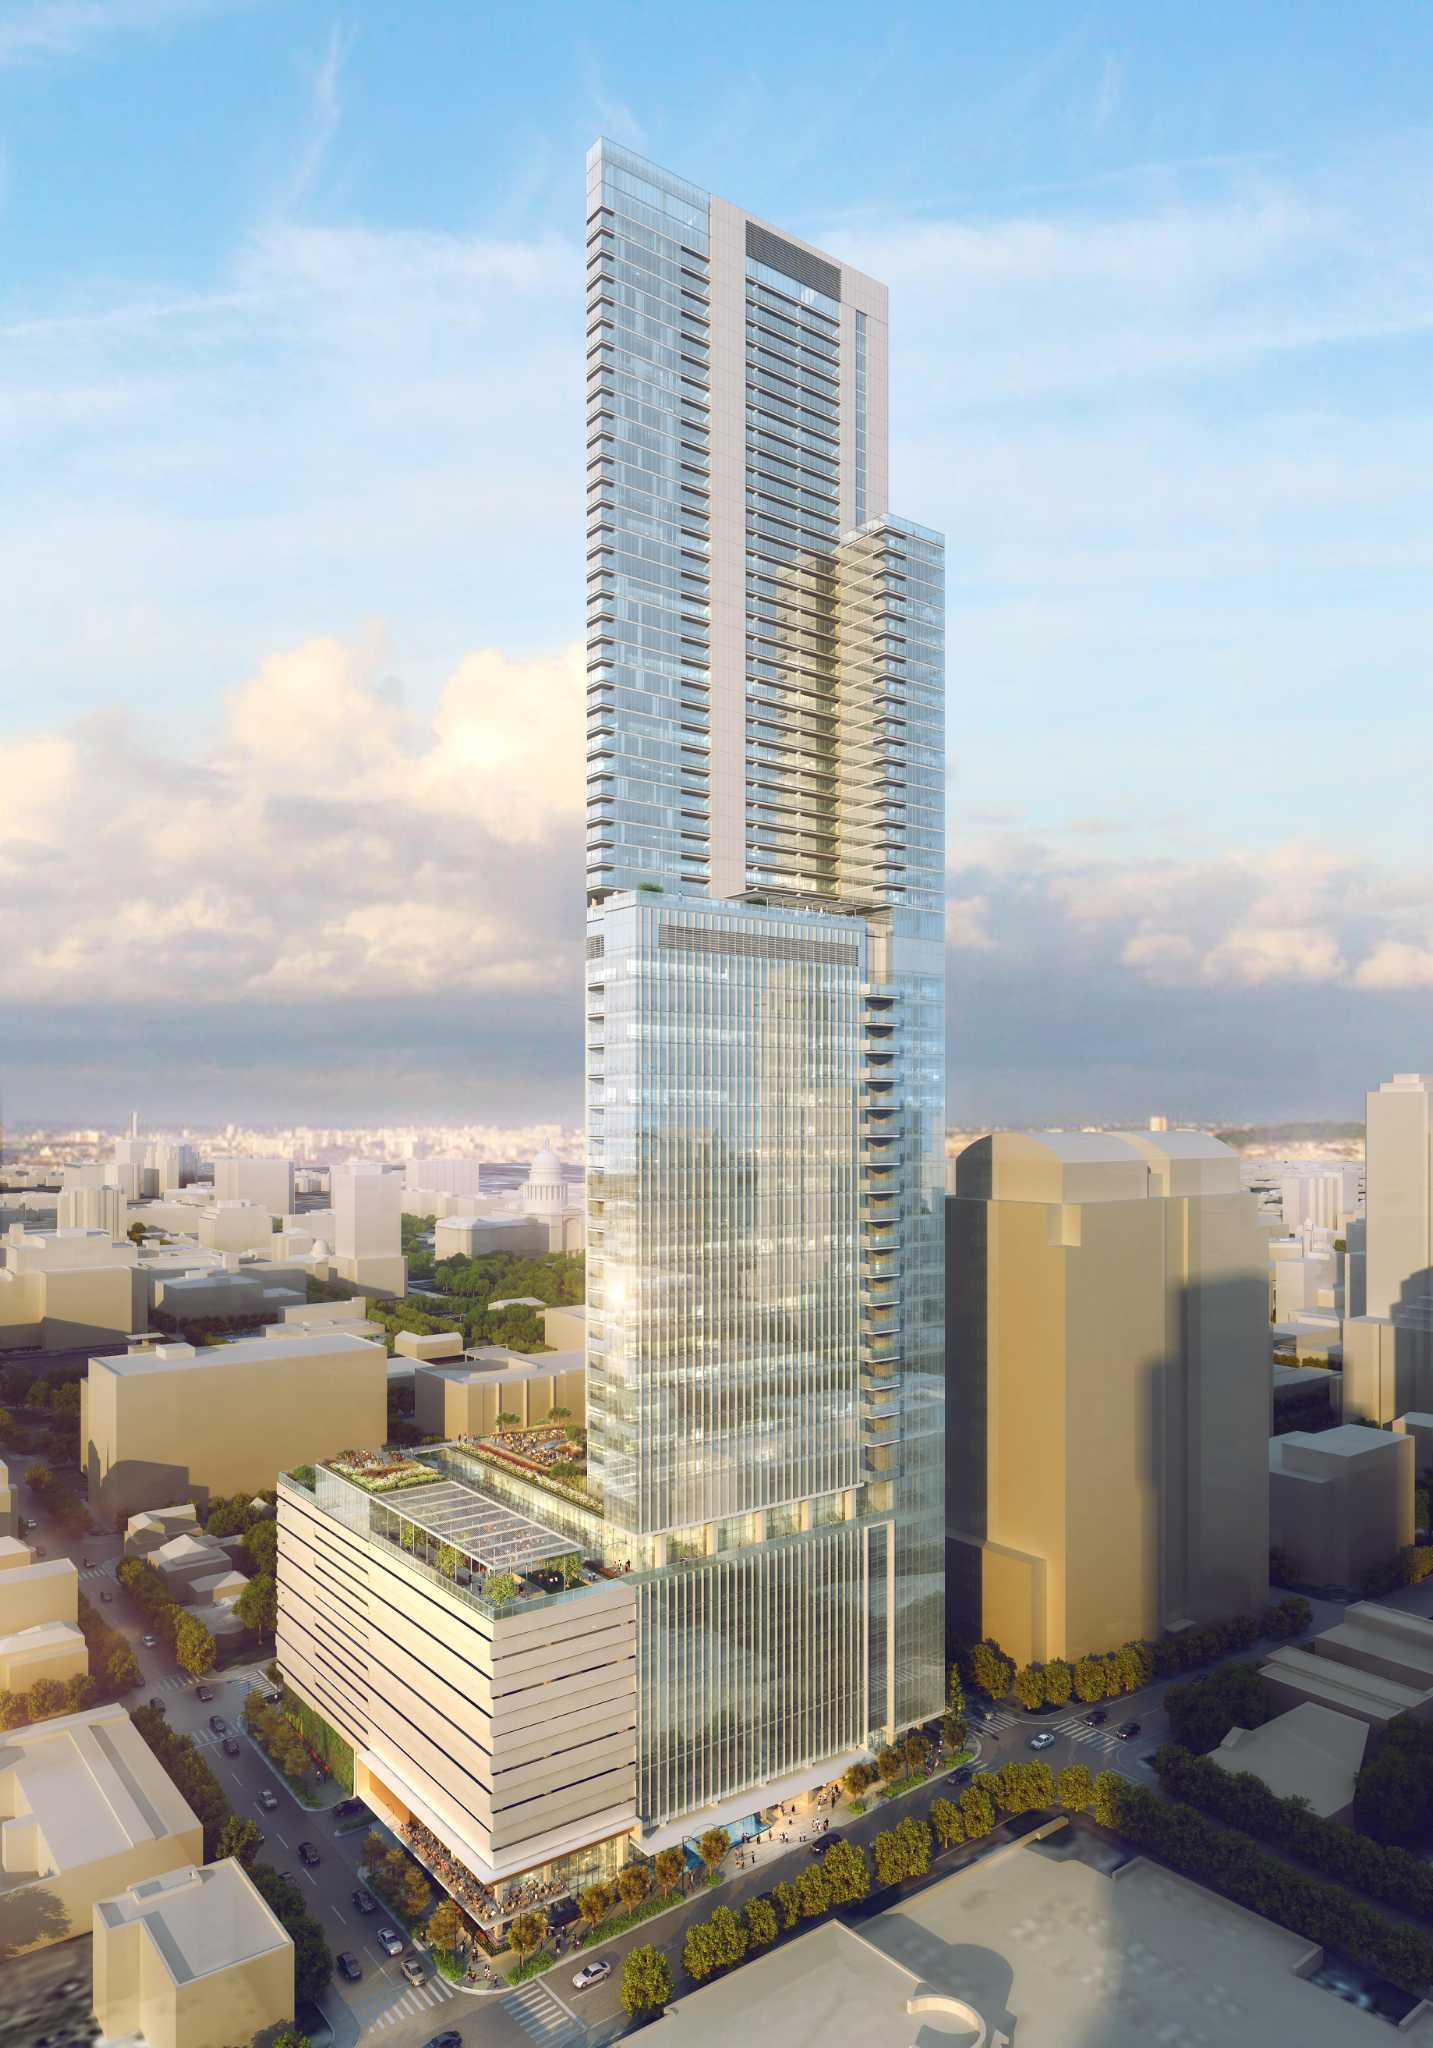 Colleges In Austin Tx >> San Antonio developer Lynd to build tallest building … in Austin - San Antonio Express-News